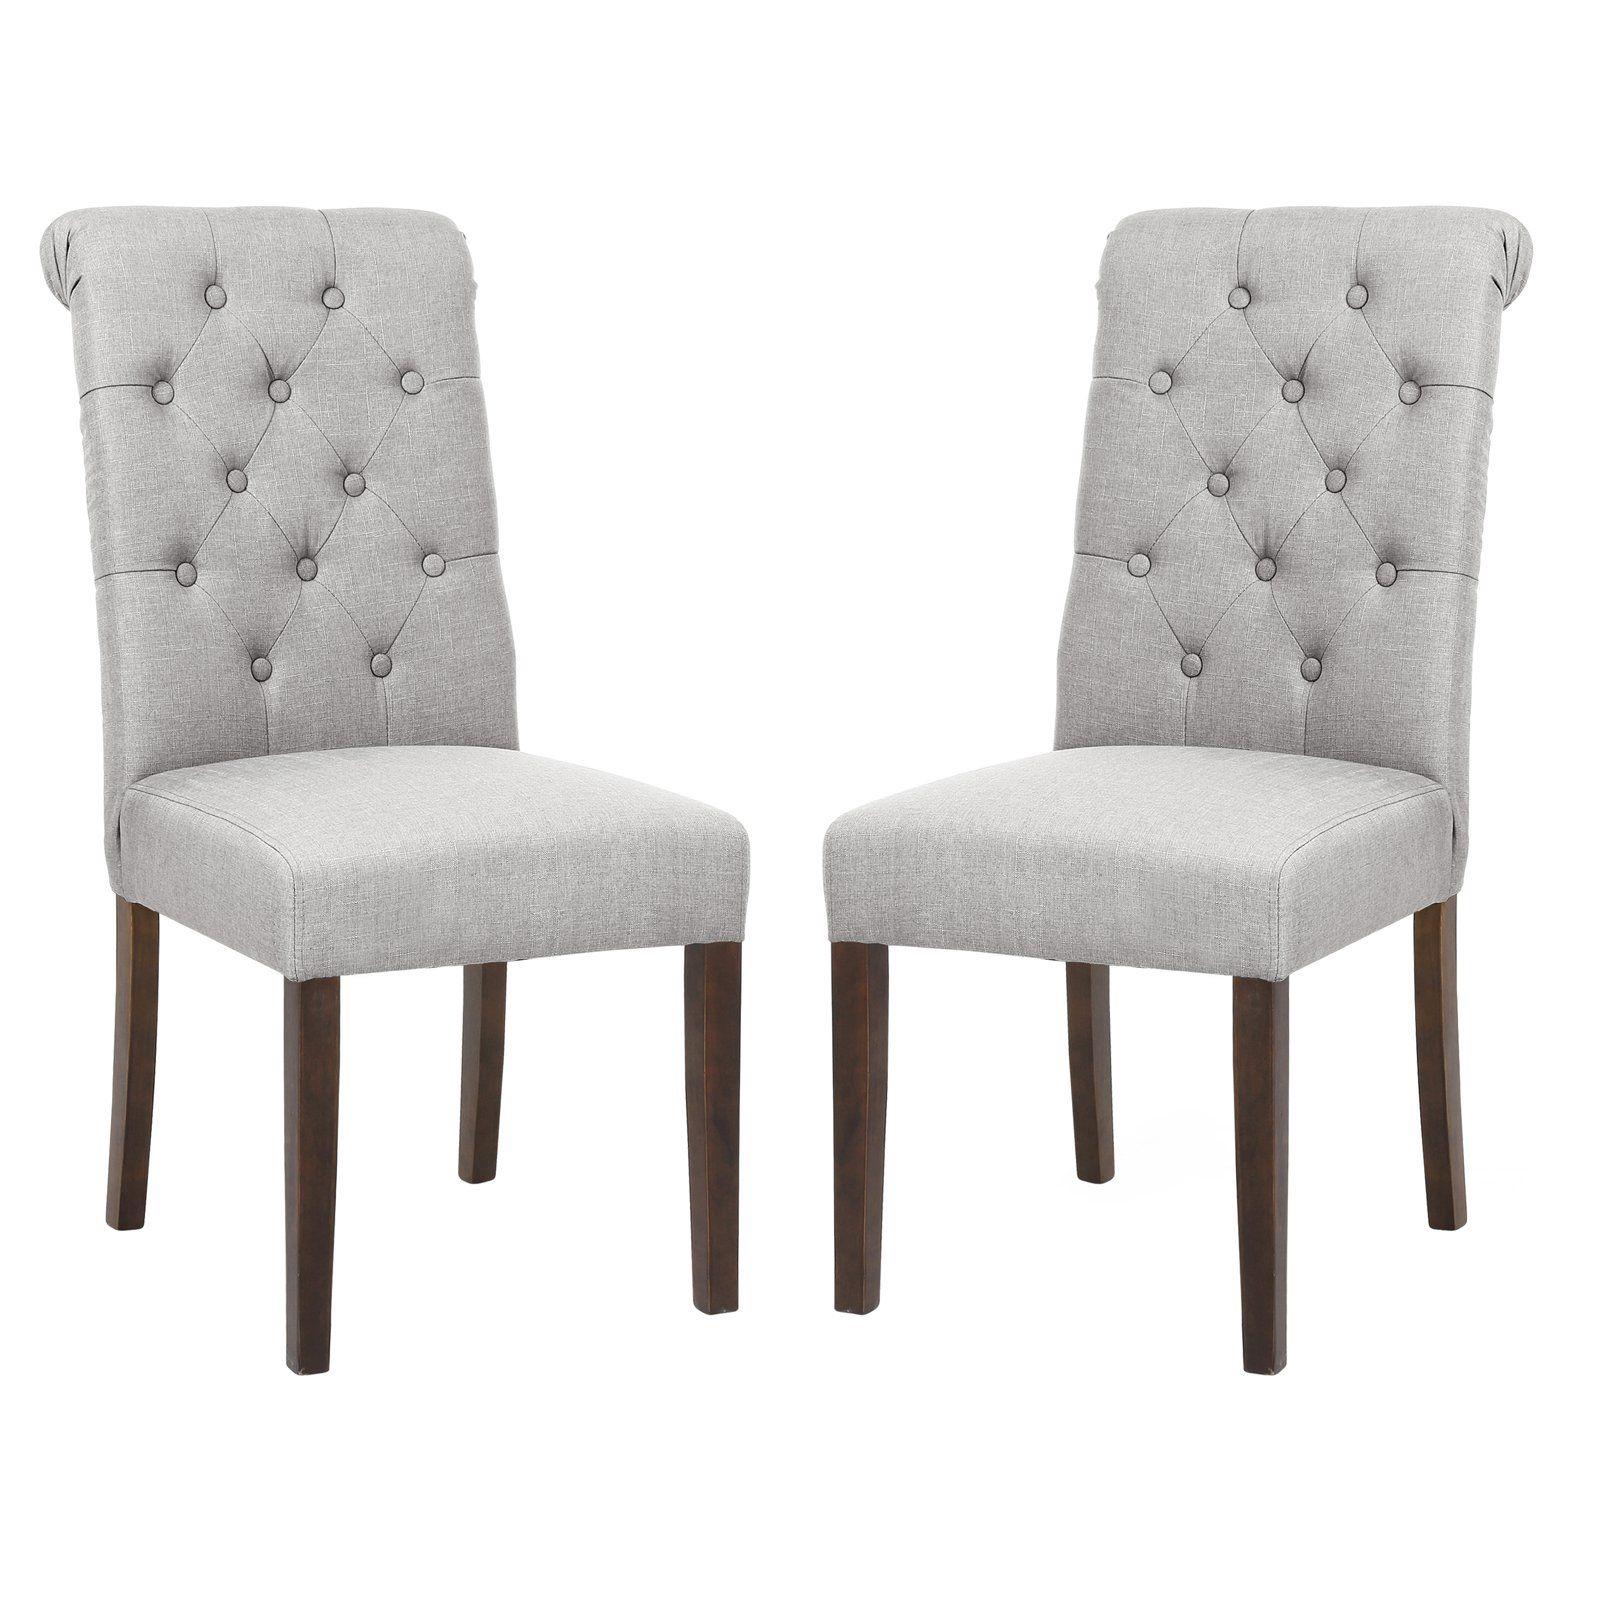 Edgemod Atlanta Tufted Parson Dining Chair Set Of 2 Upholstered Dining Chairs Dining Chairs